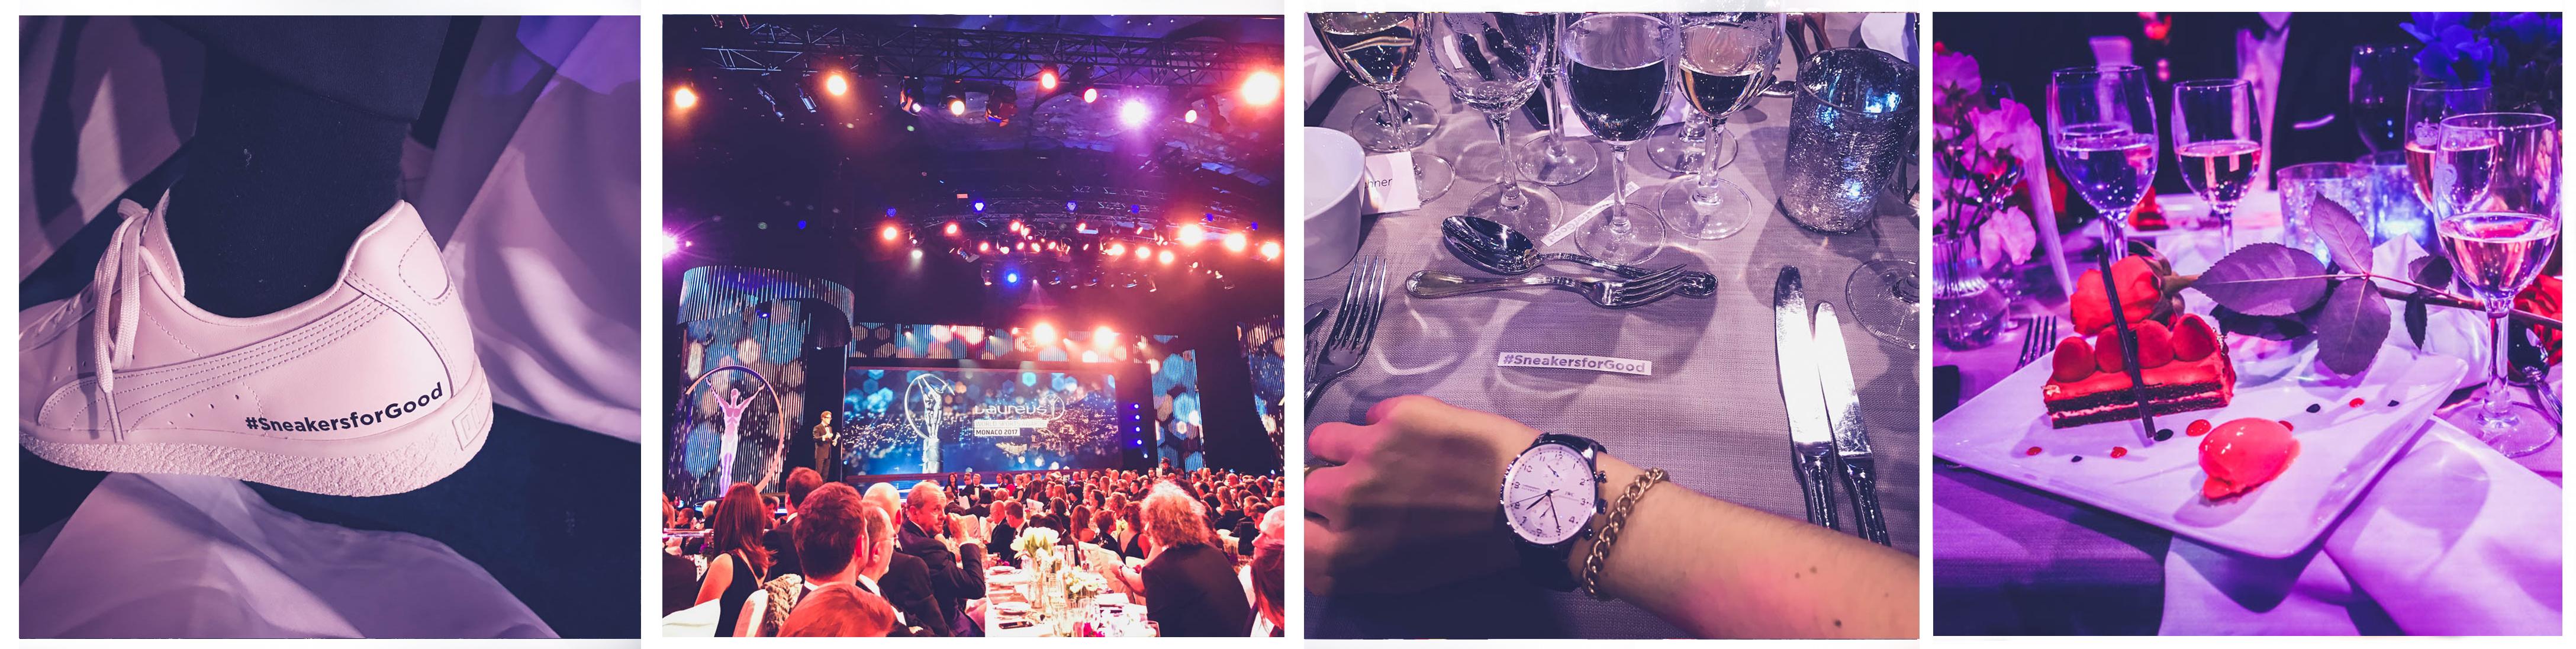 Lifestyleblog-Lifestyleblogger-Lifestyle-Blog-Blogger-Laureus-Award-2017-Monaco-2